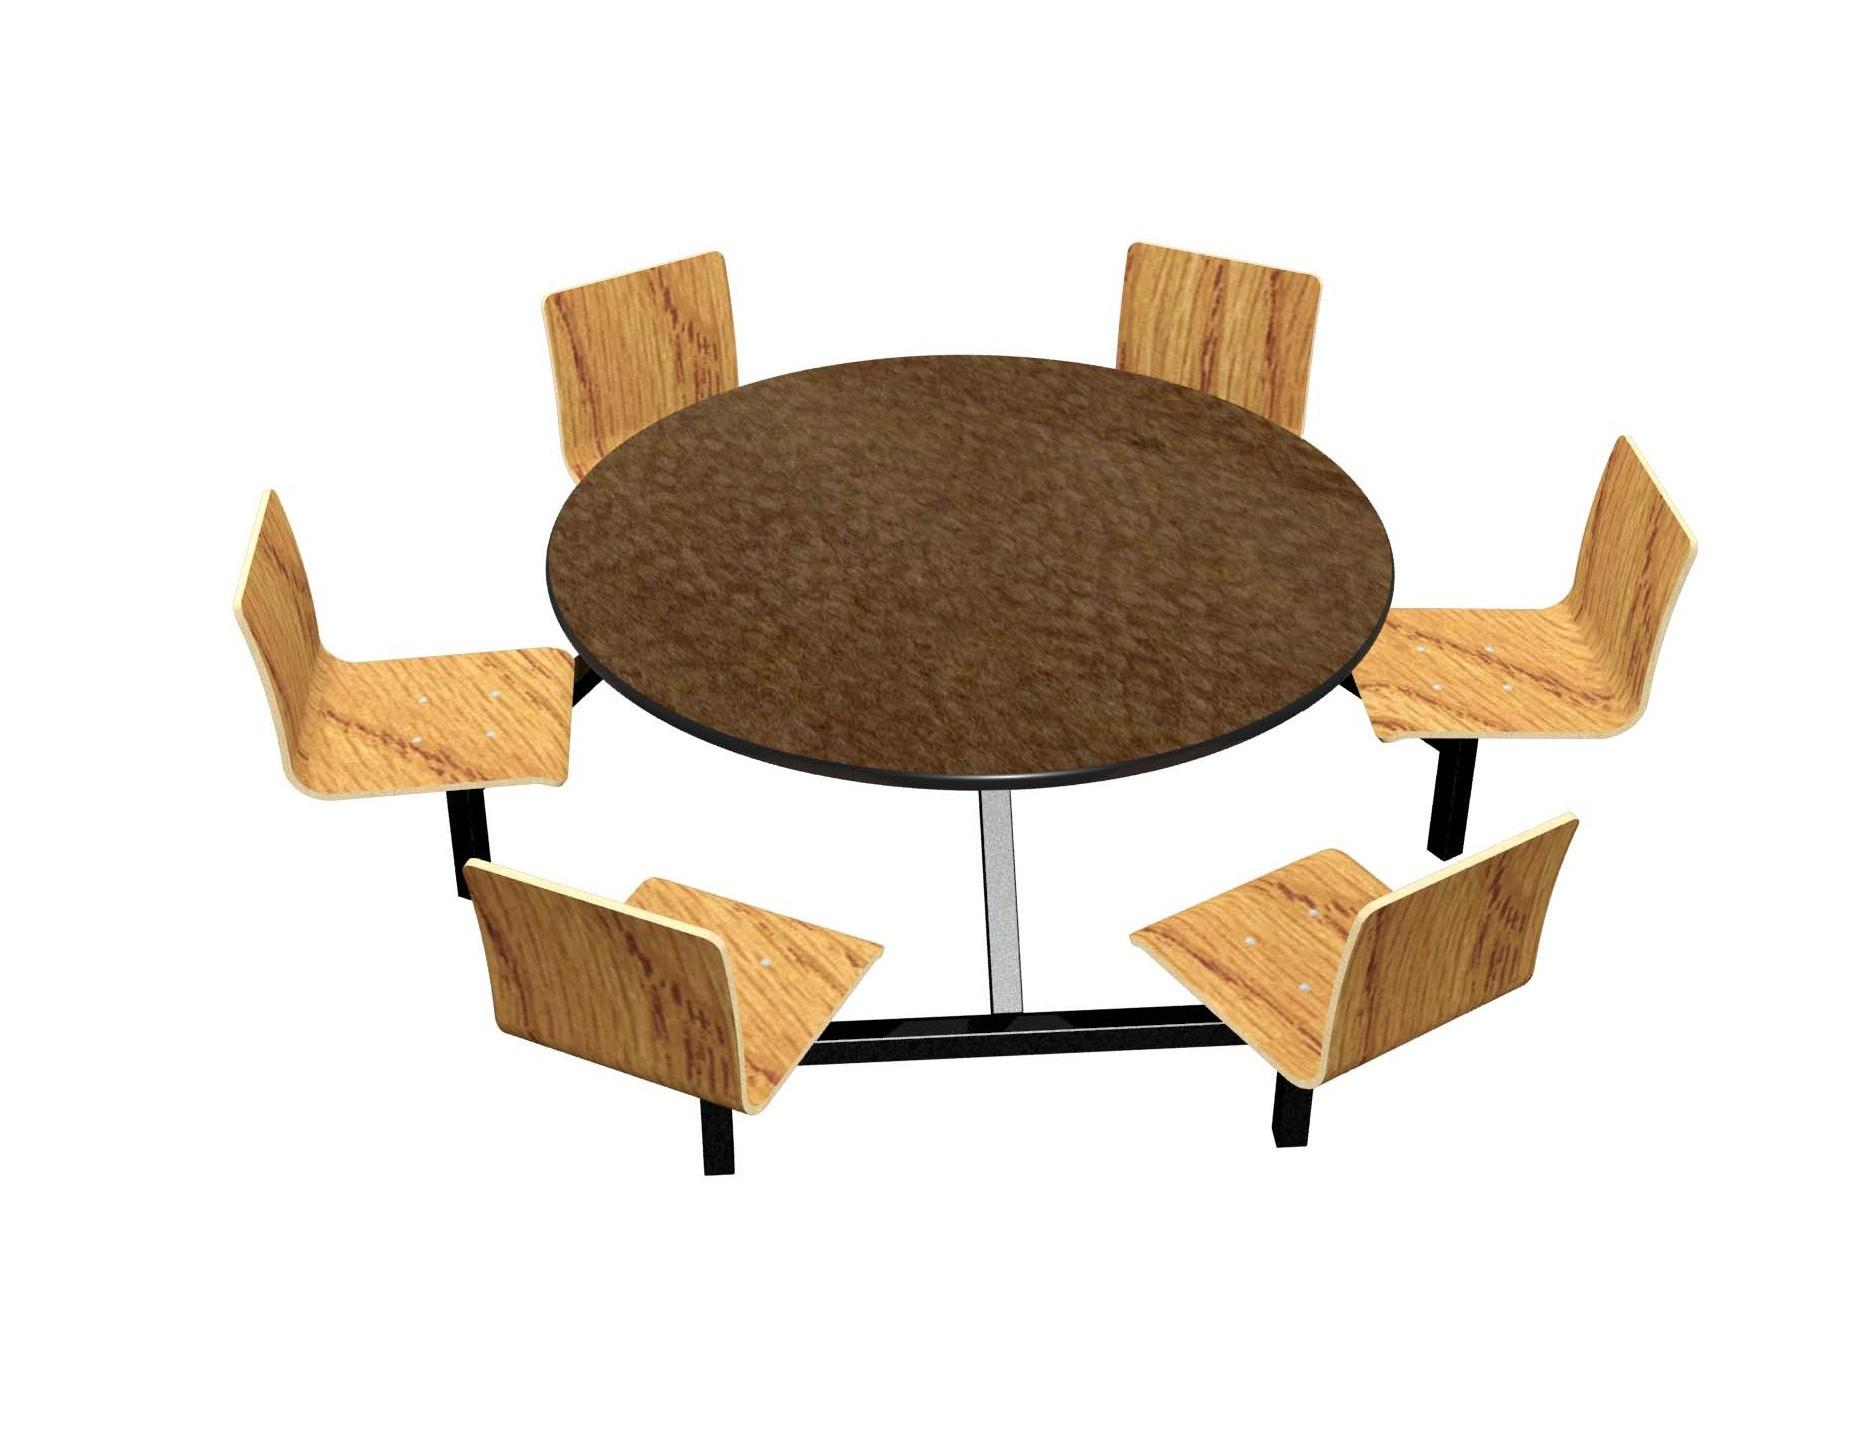 Morro Zephyr laminate table, Black vinyl edge, Natural Oak laminate chairhead